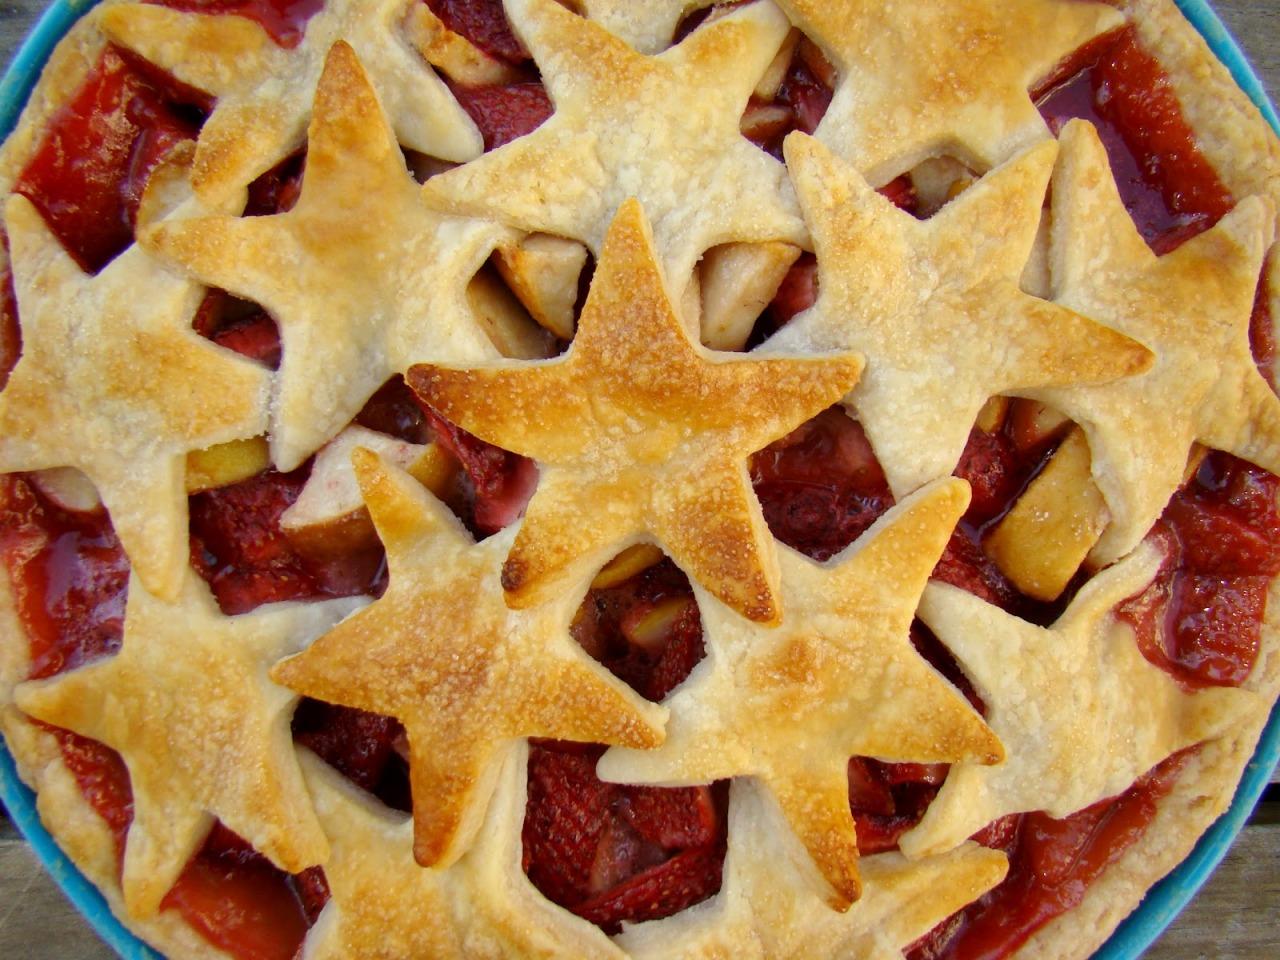 Recipe: Strawberry Apple Pie